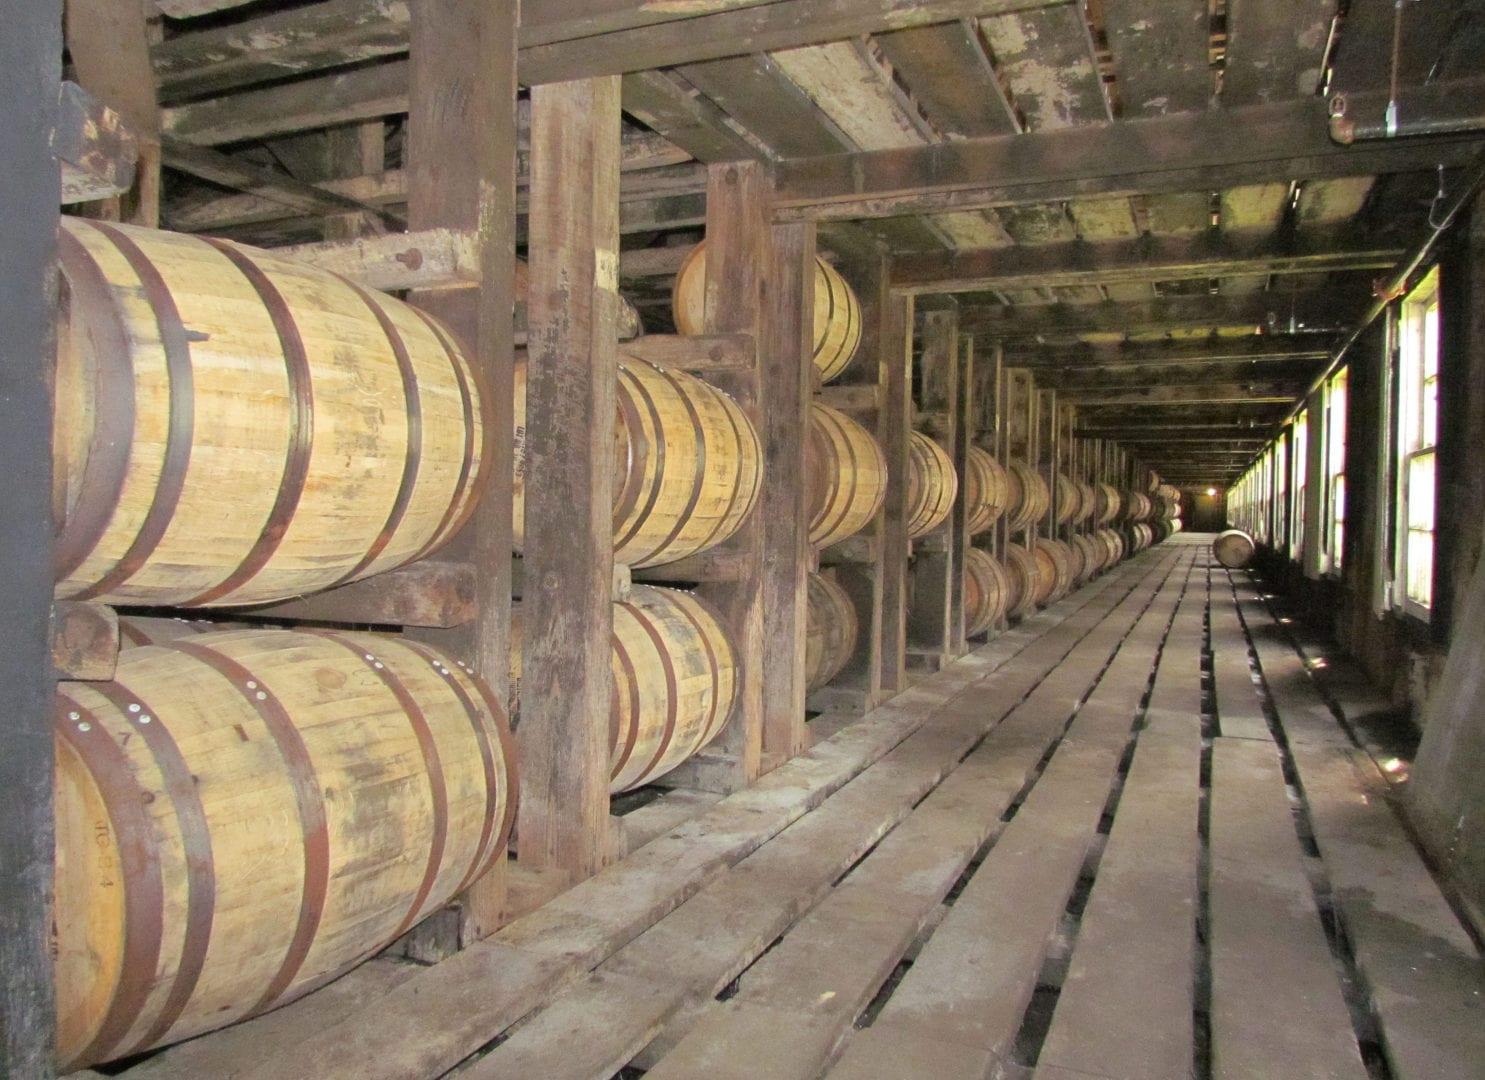 Barrels of wine at the Wild Turkey Rickhouse